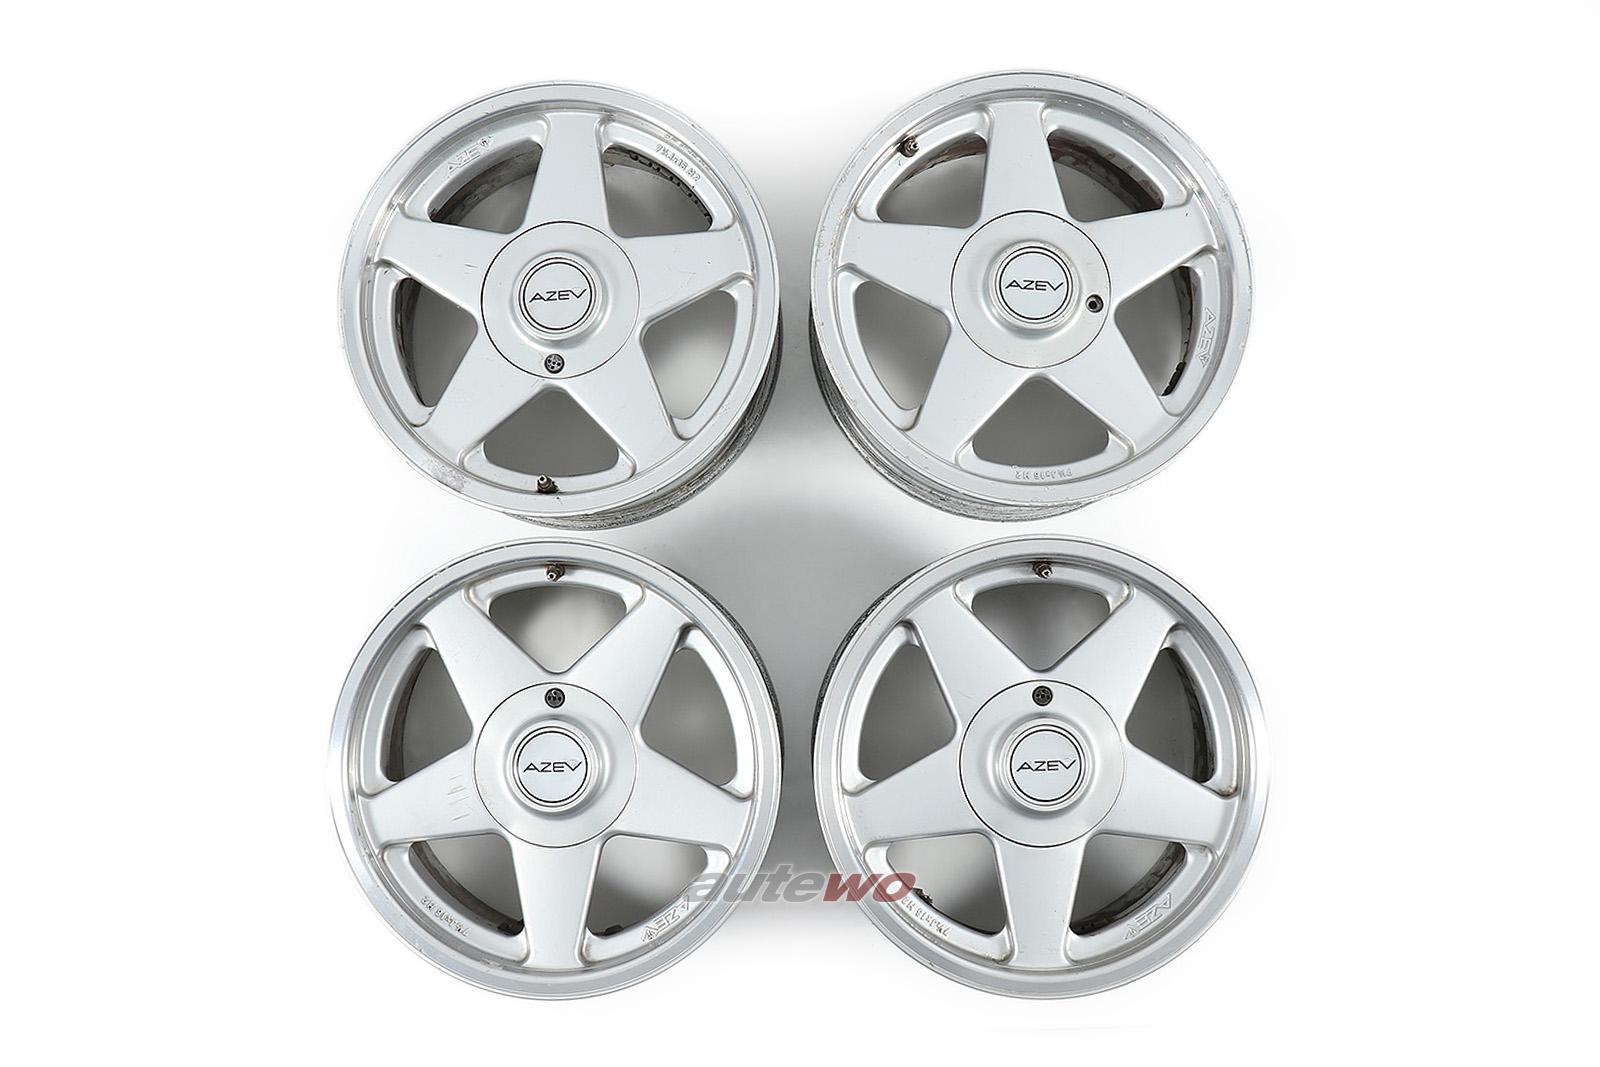 AZEV A Alufelgen 7,5x16 ET30 5x112 für Audi Urquattro/Coupe 89/S2/100/200 44/C4